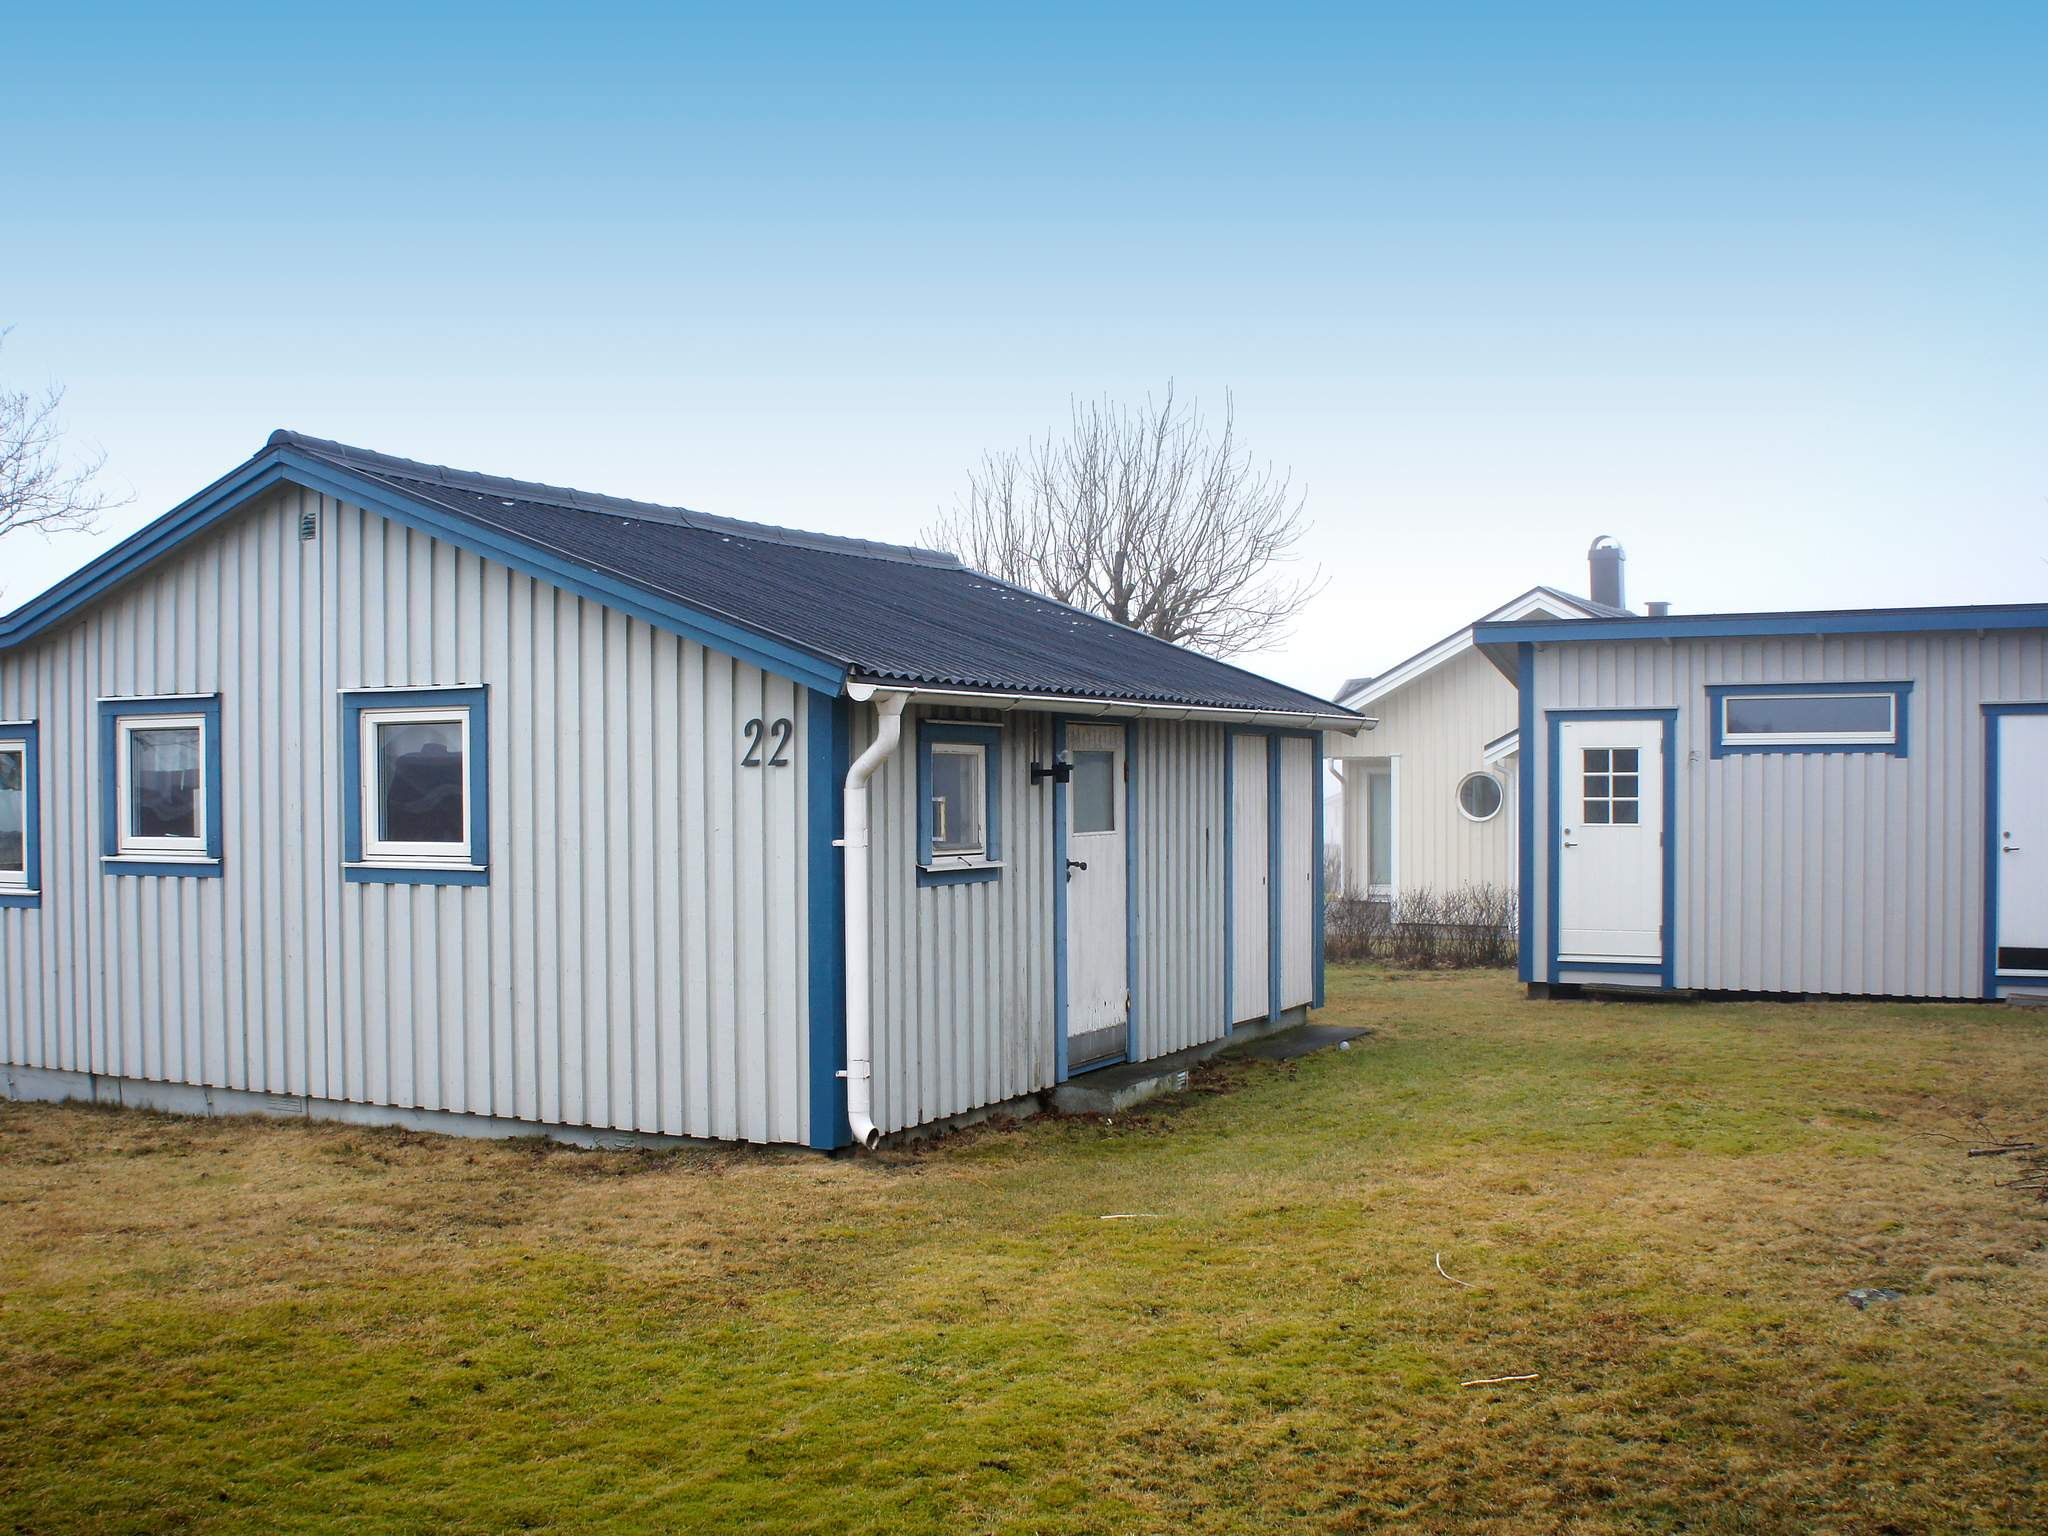 Ferienhaus Varberg (87134), Tvååker, Hallands län, Südschweden, Schweden, Bild 10